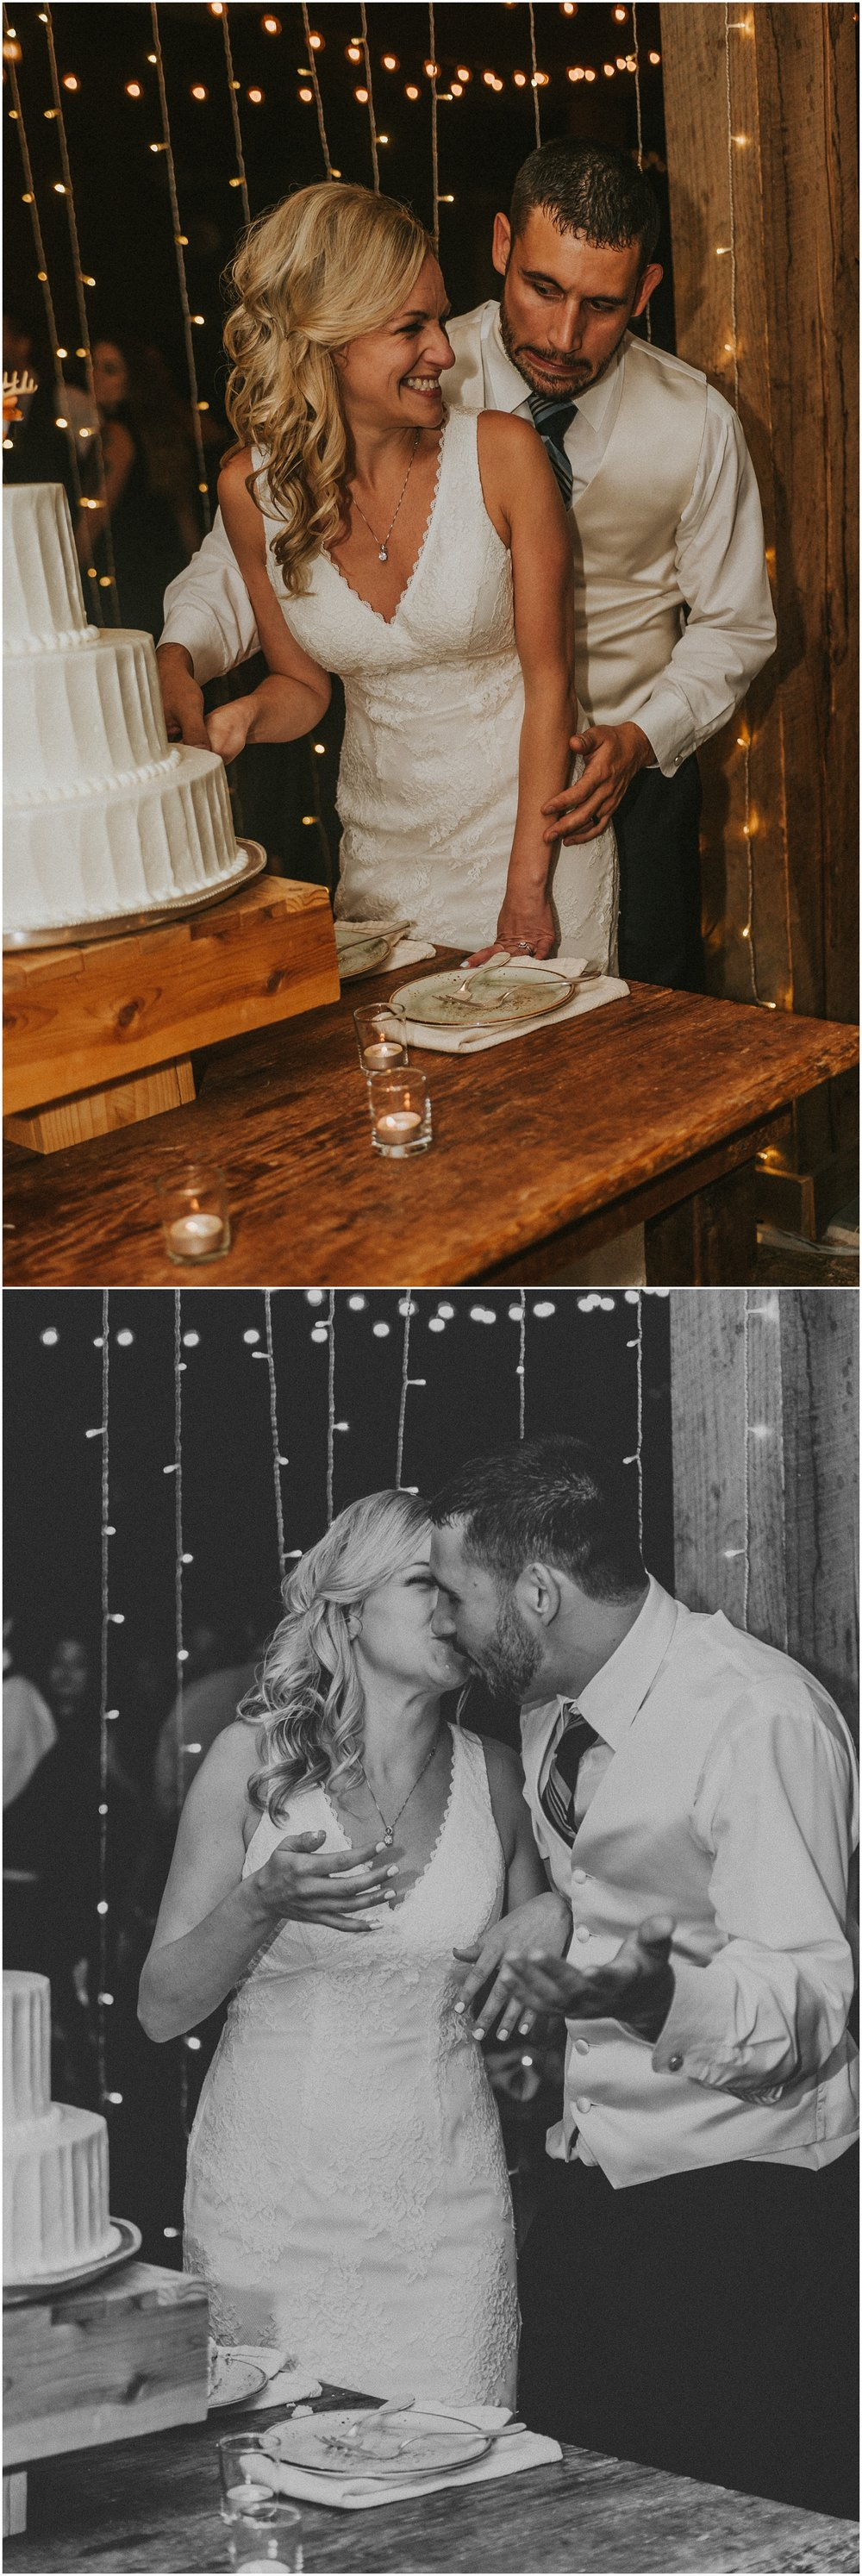 waterloo-village-waterloo village-wedding-outdoor wedding-rustic-boemian-new jersey-bride-groom-wedding party-davids bridal-wedding dress-wedding-first kiss-intimate wedding_0388.jpg